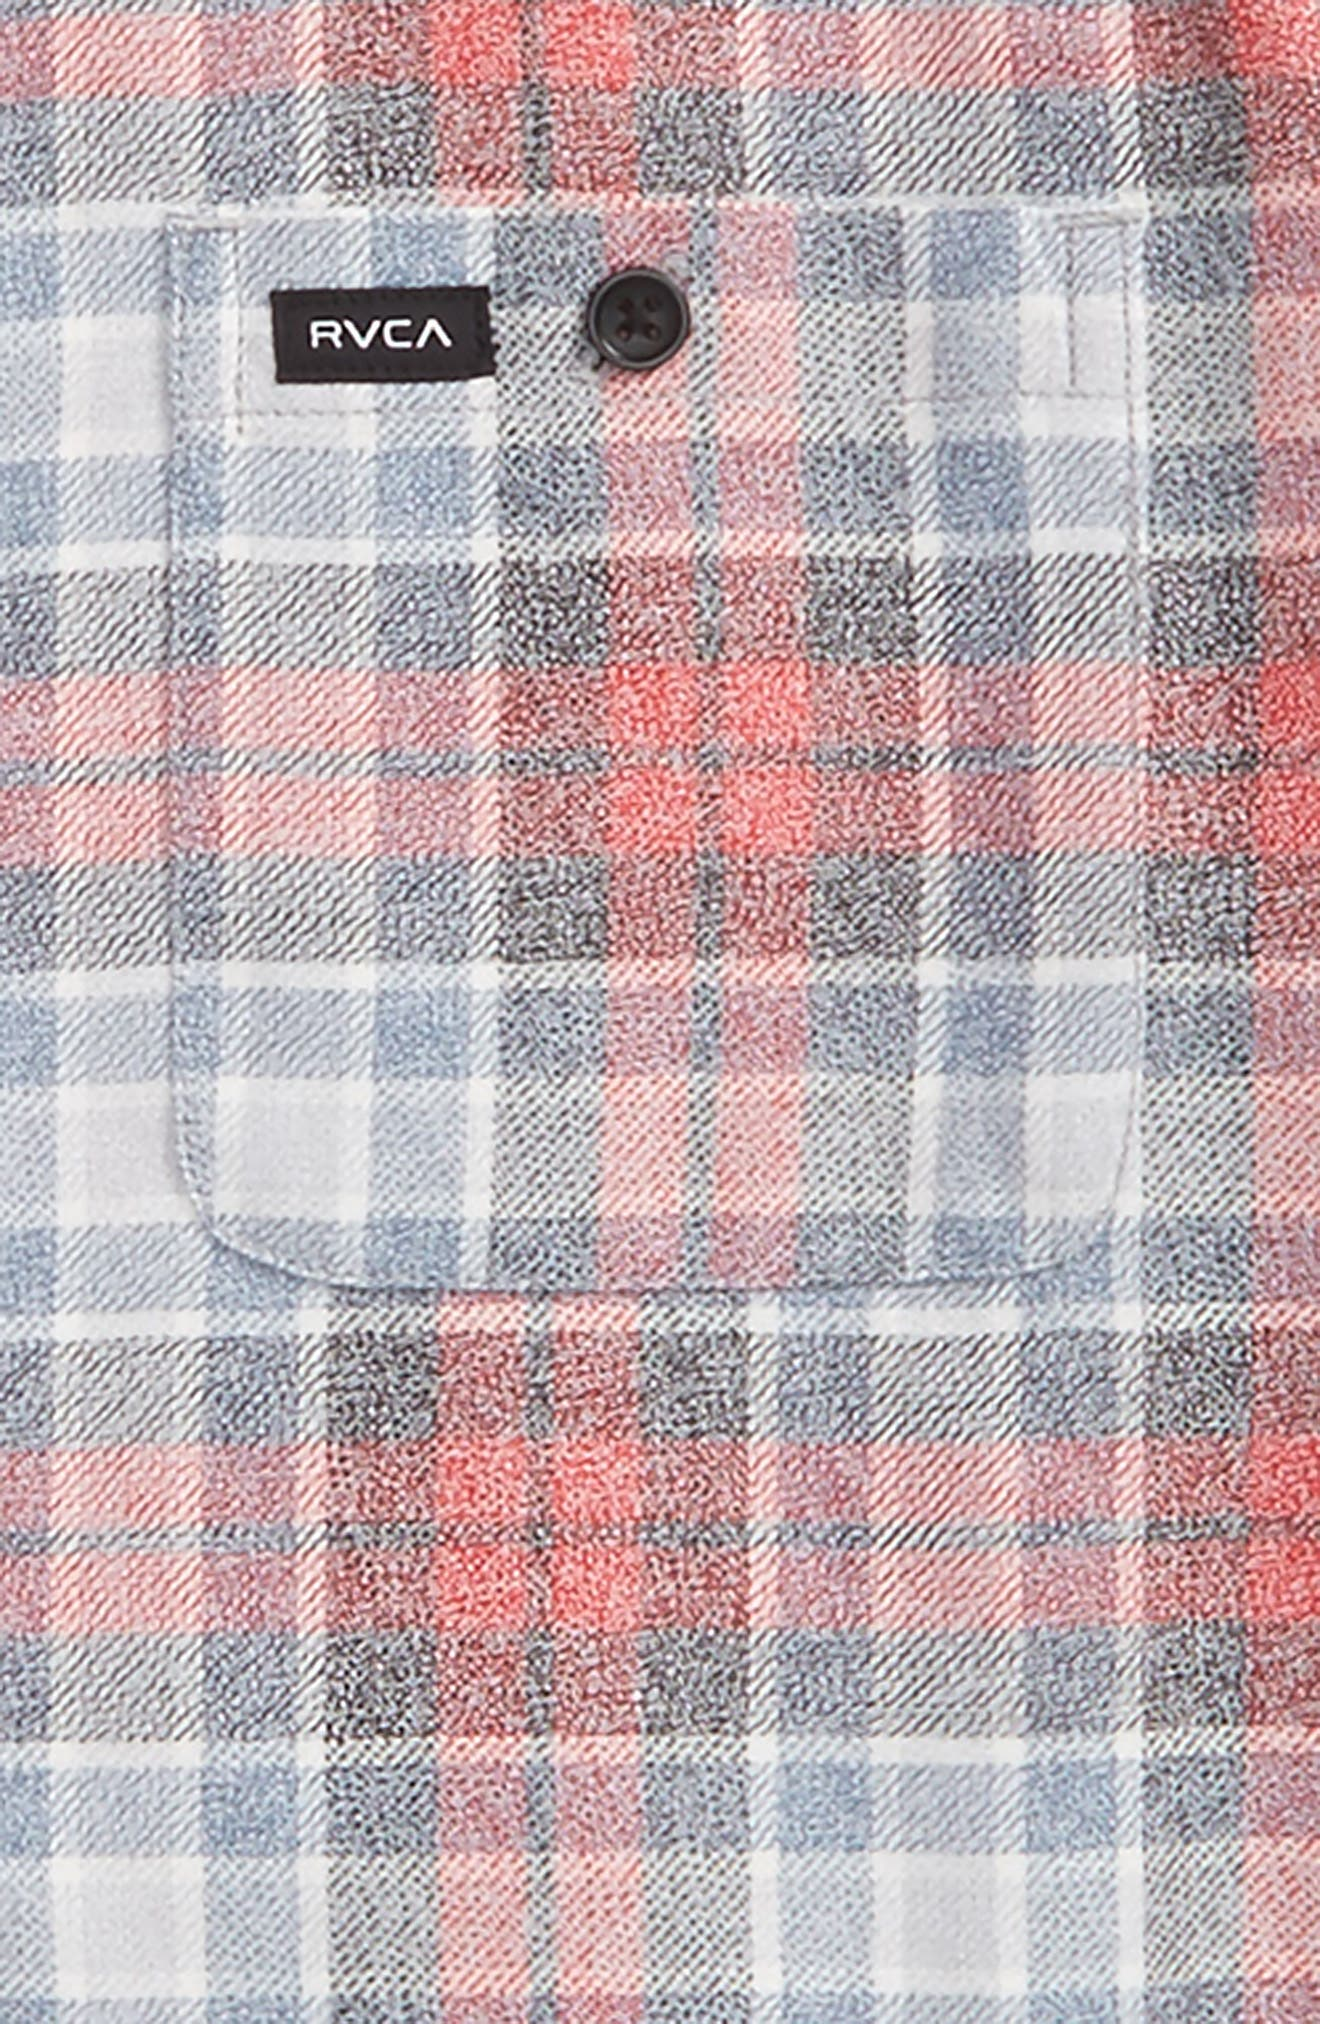 Diffusion Plaid Shirt,                             Alternate thumbnail 2, color,                             258